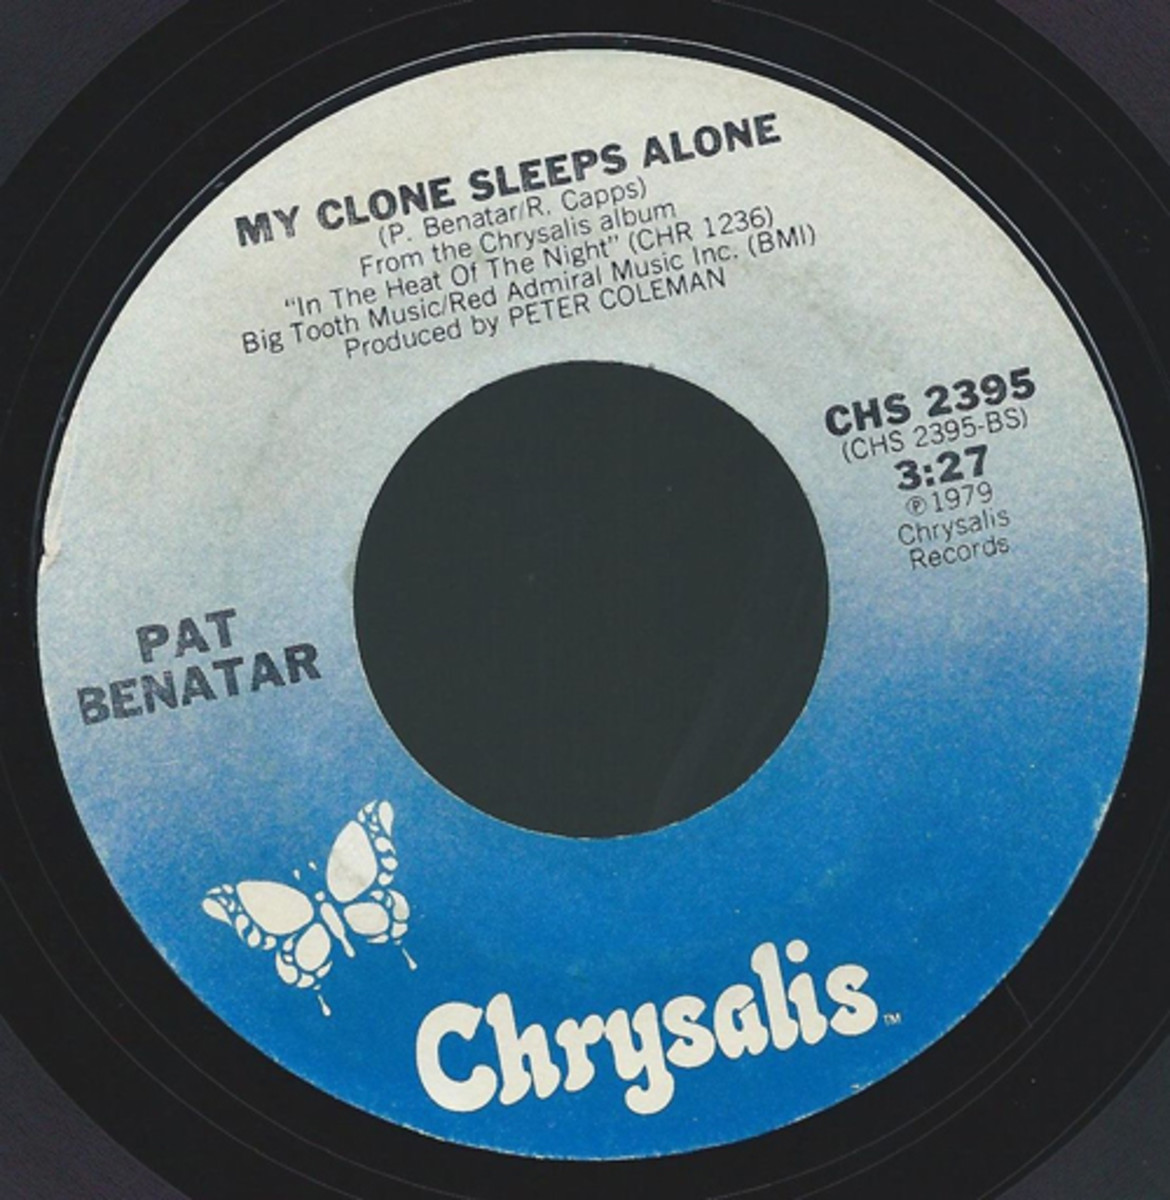 Pat Benatar flip side